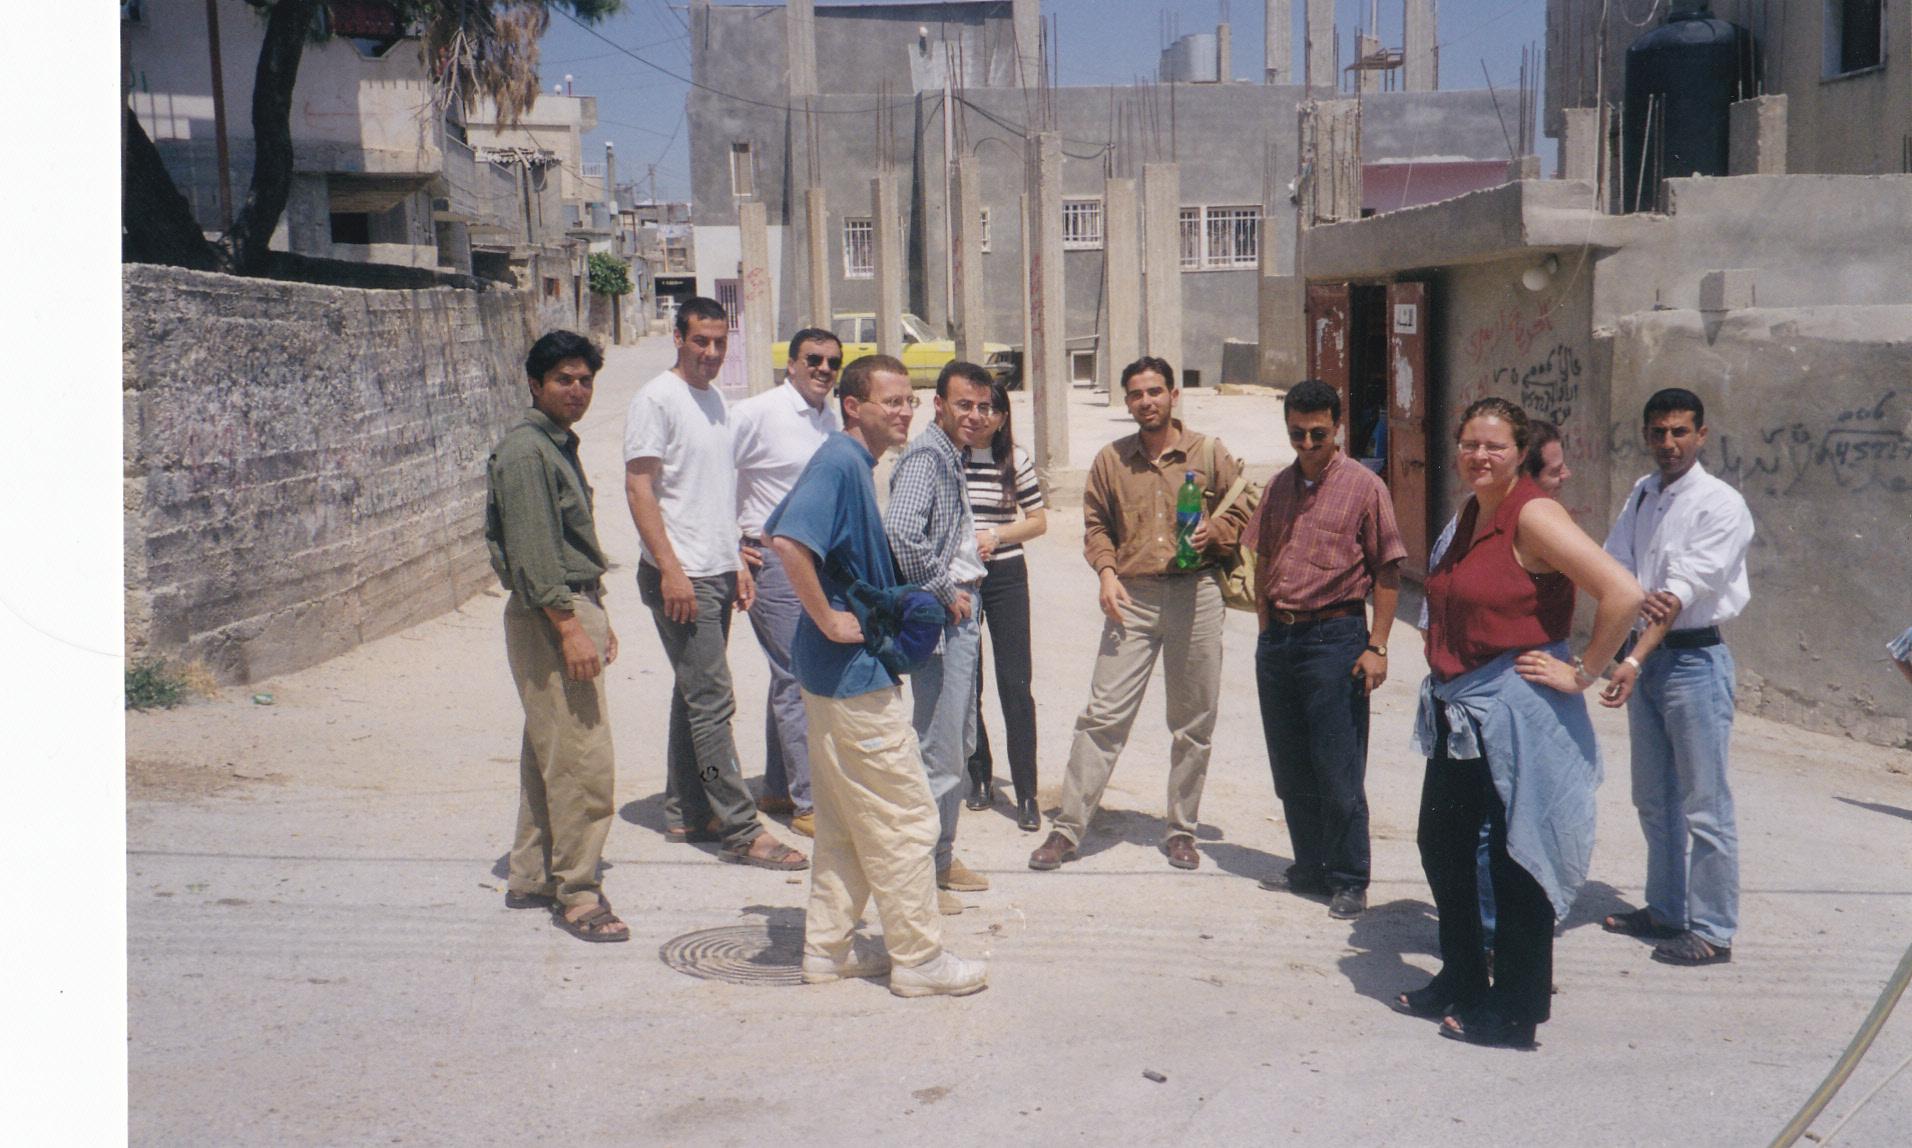 Balata refugee camp, West Bank